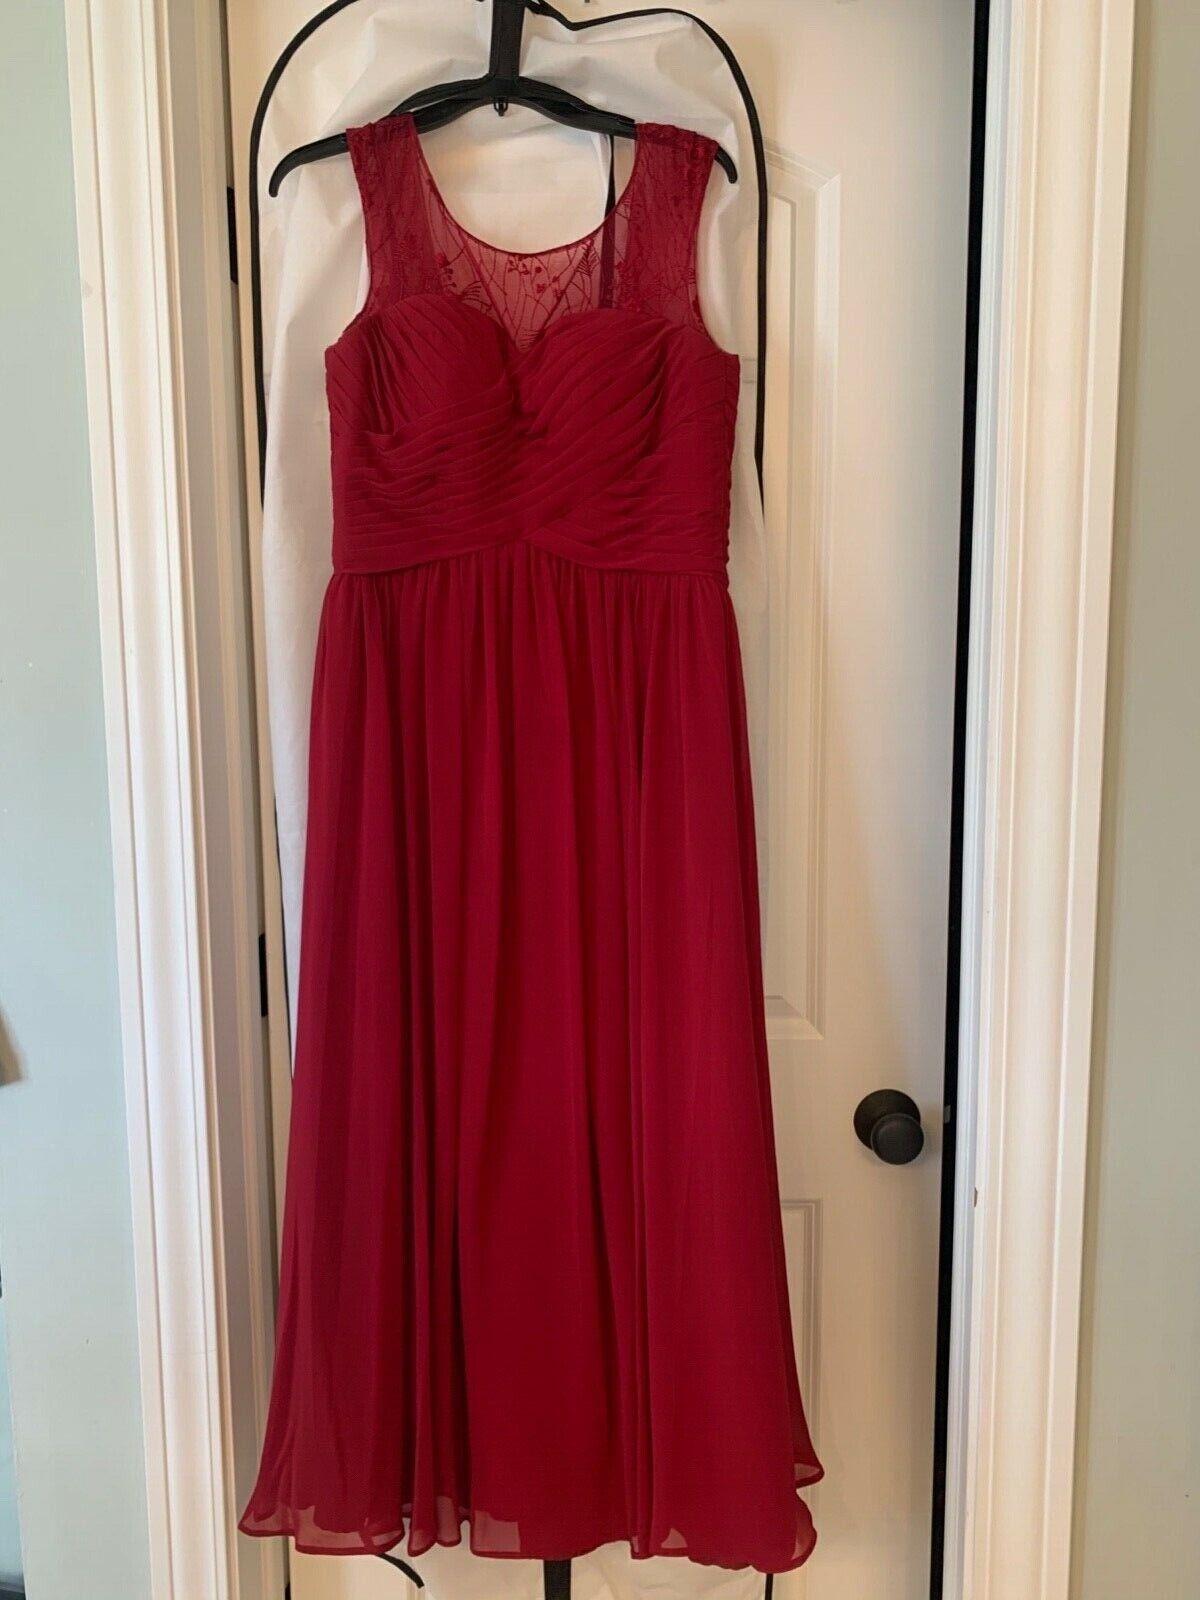 Azazie Tobey Bridesmaids/Maid of Honor Dress - Size A6 - Burgundy - Cap Sleeve